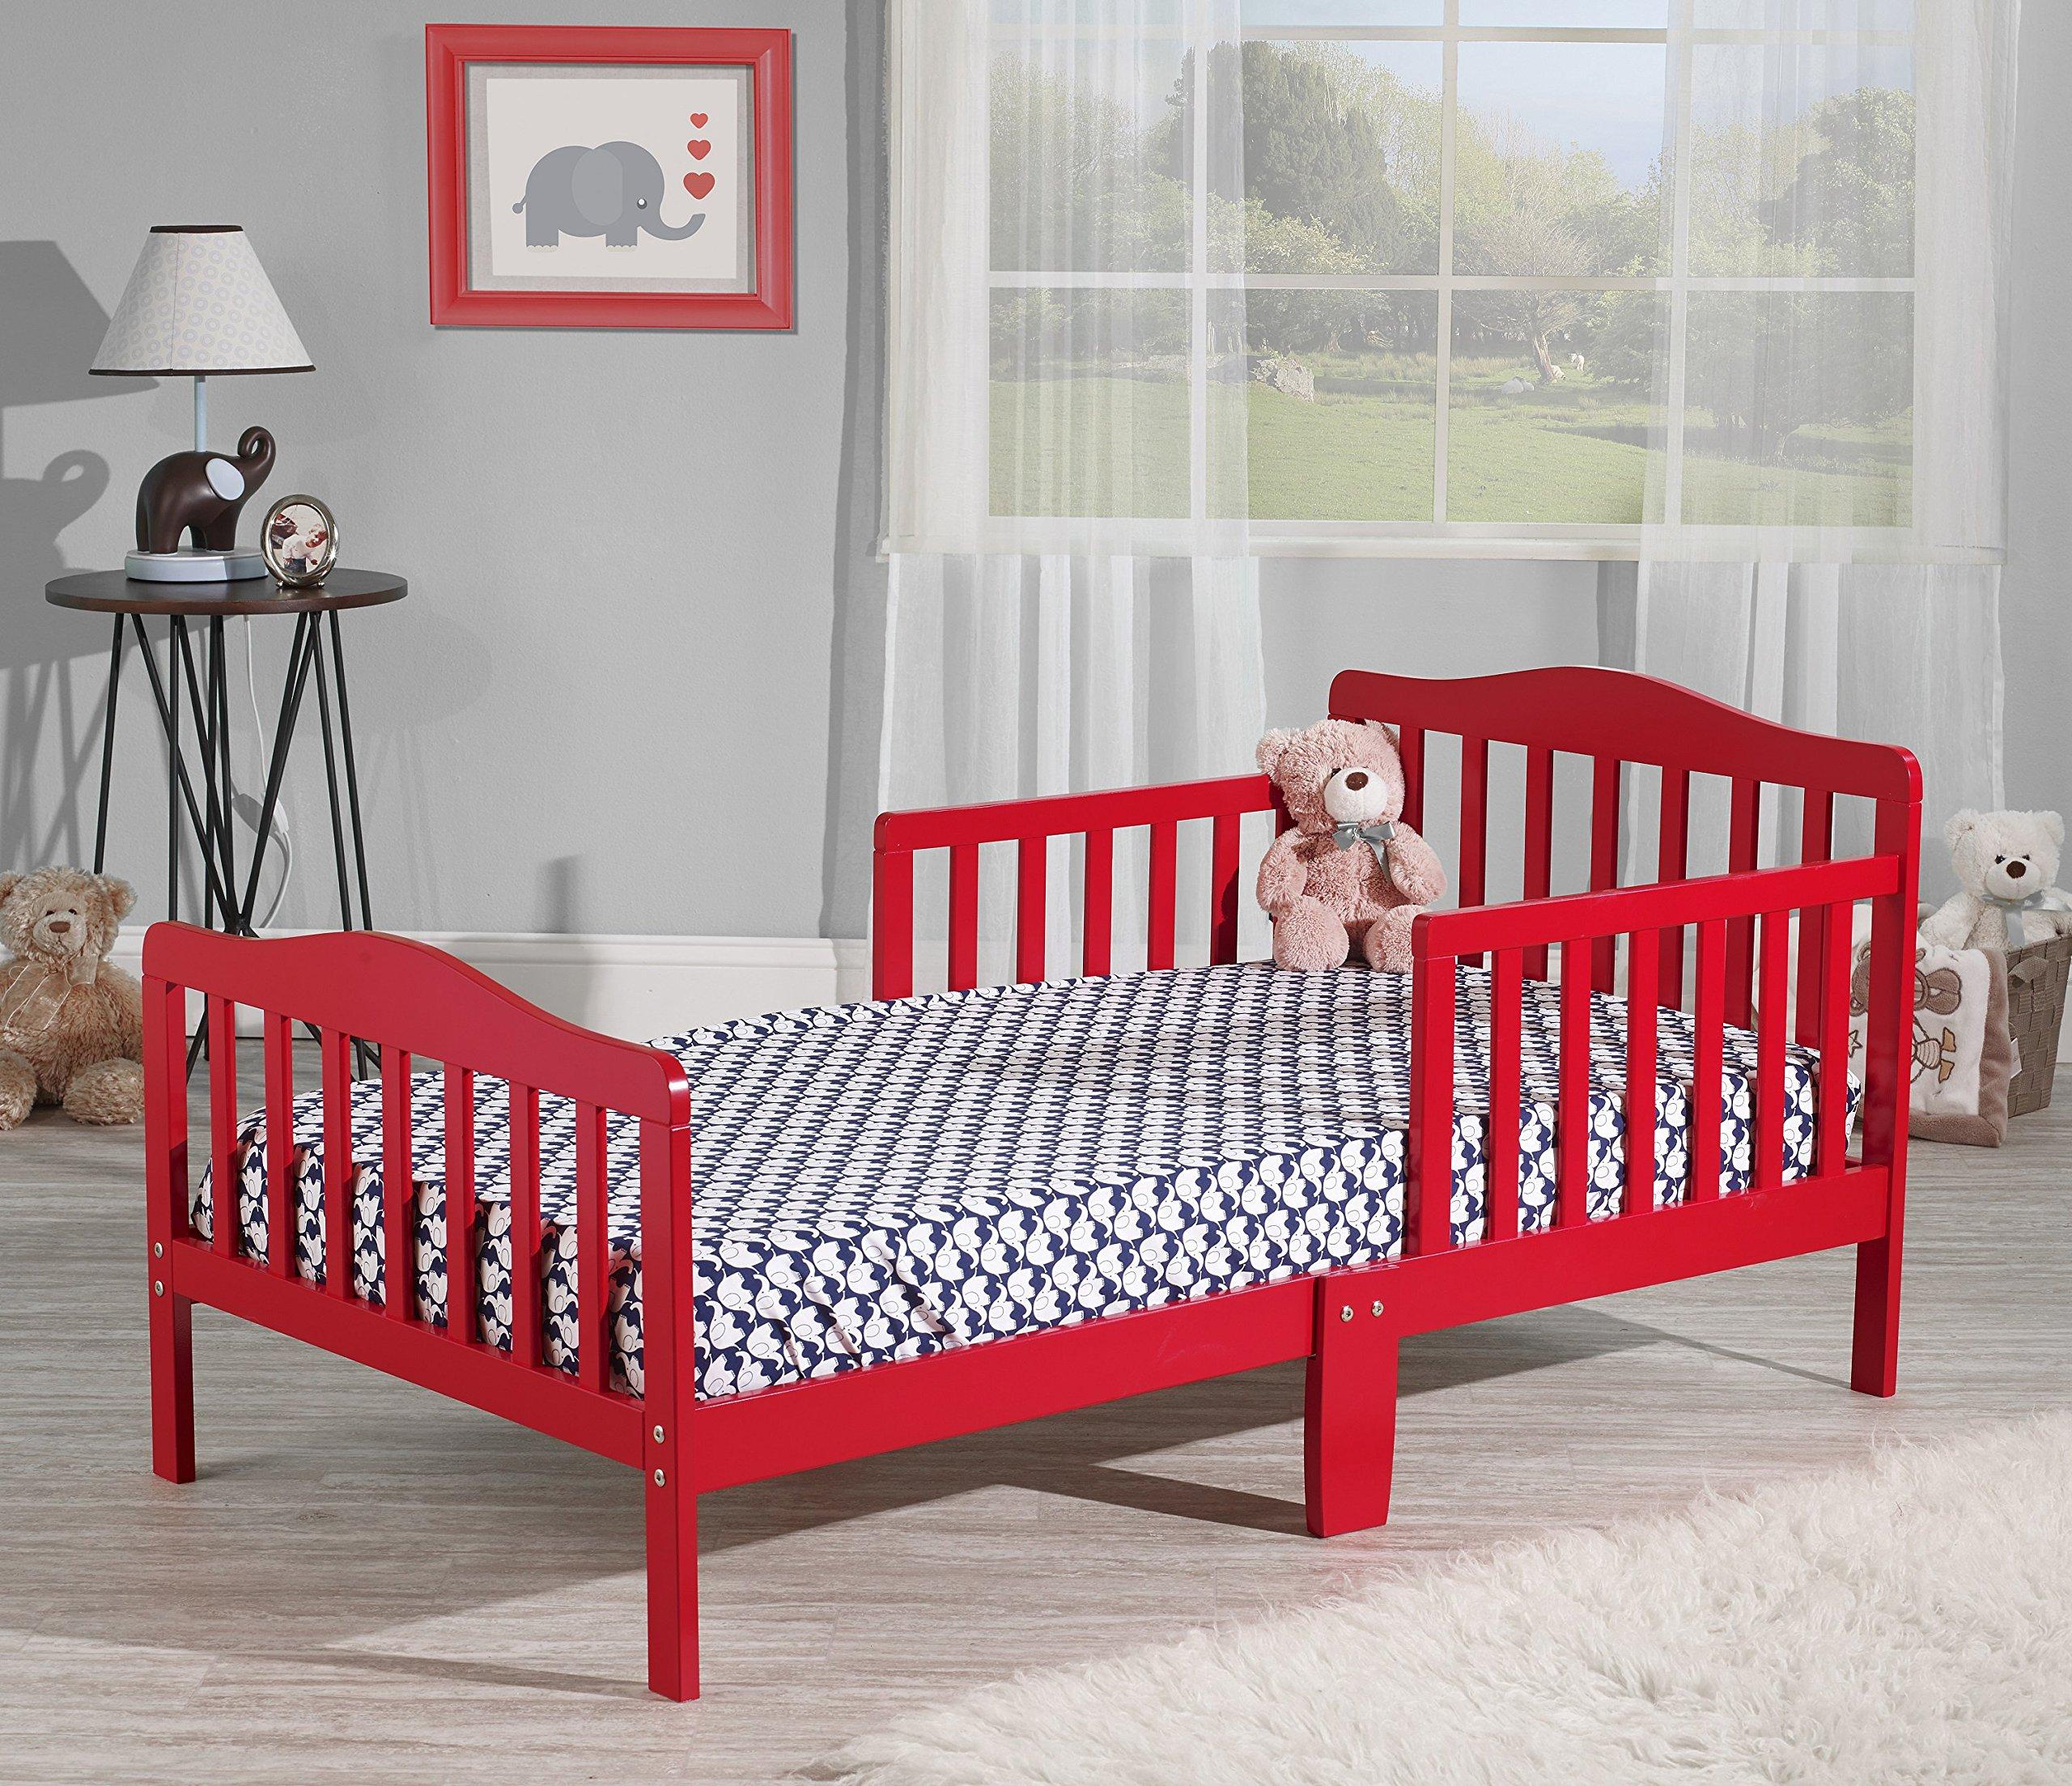 Orbelle Toddler Bed, 3-6T, Red